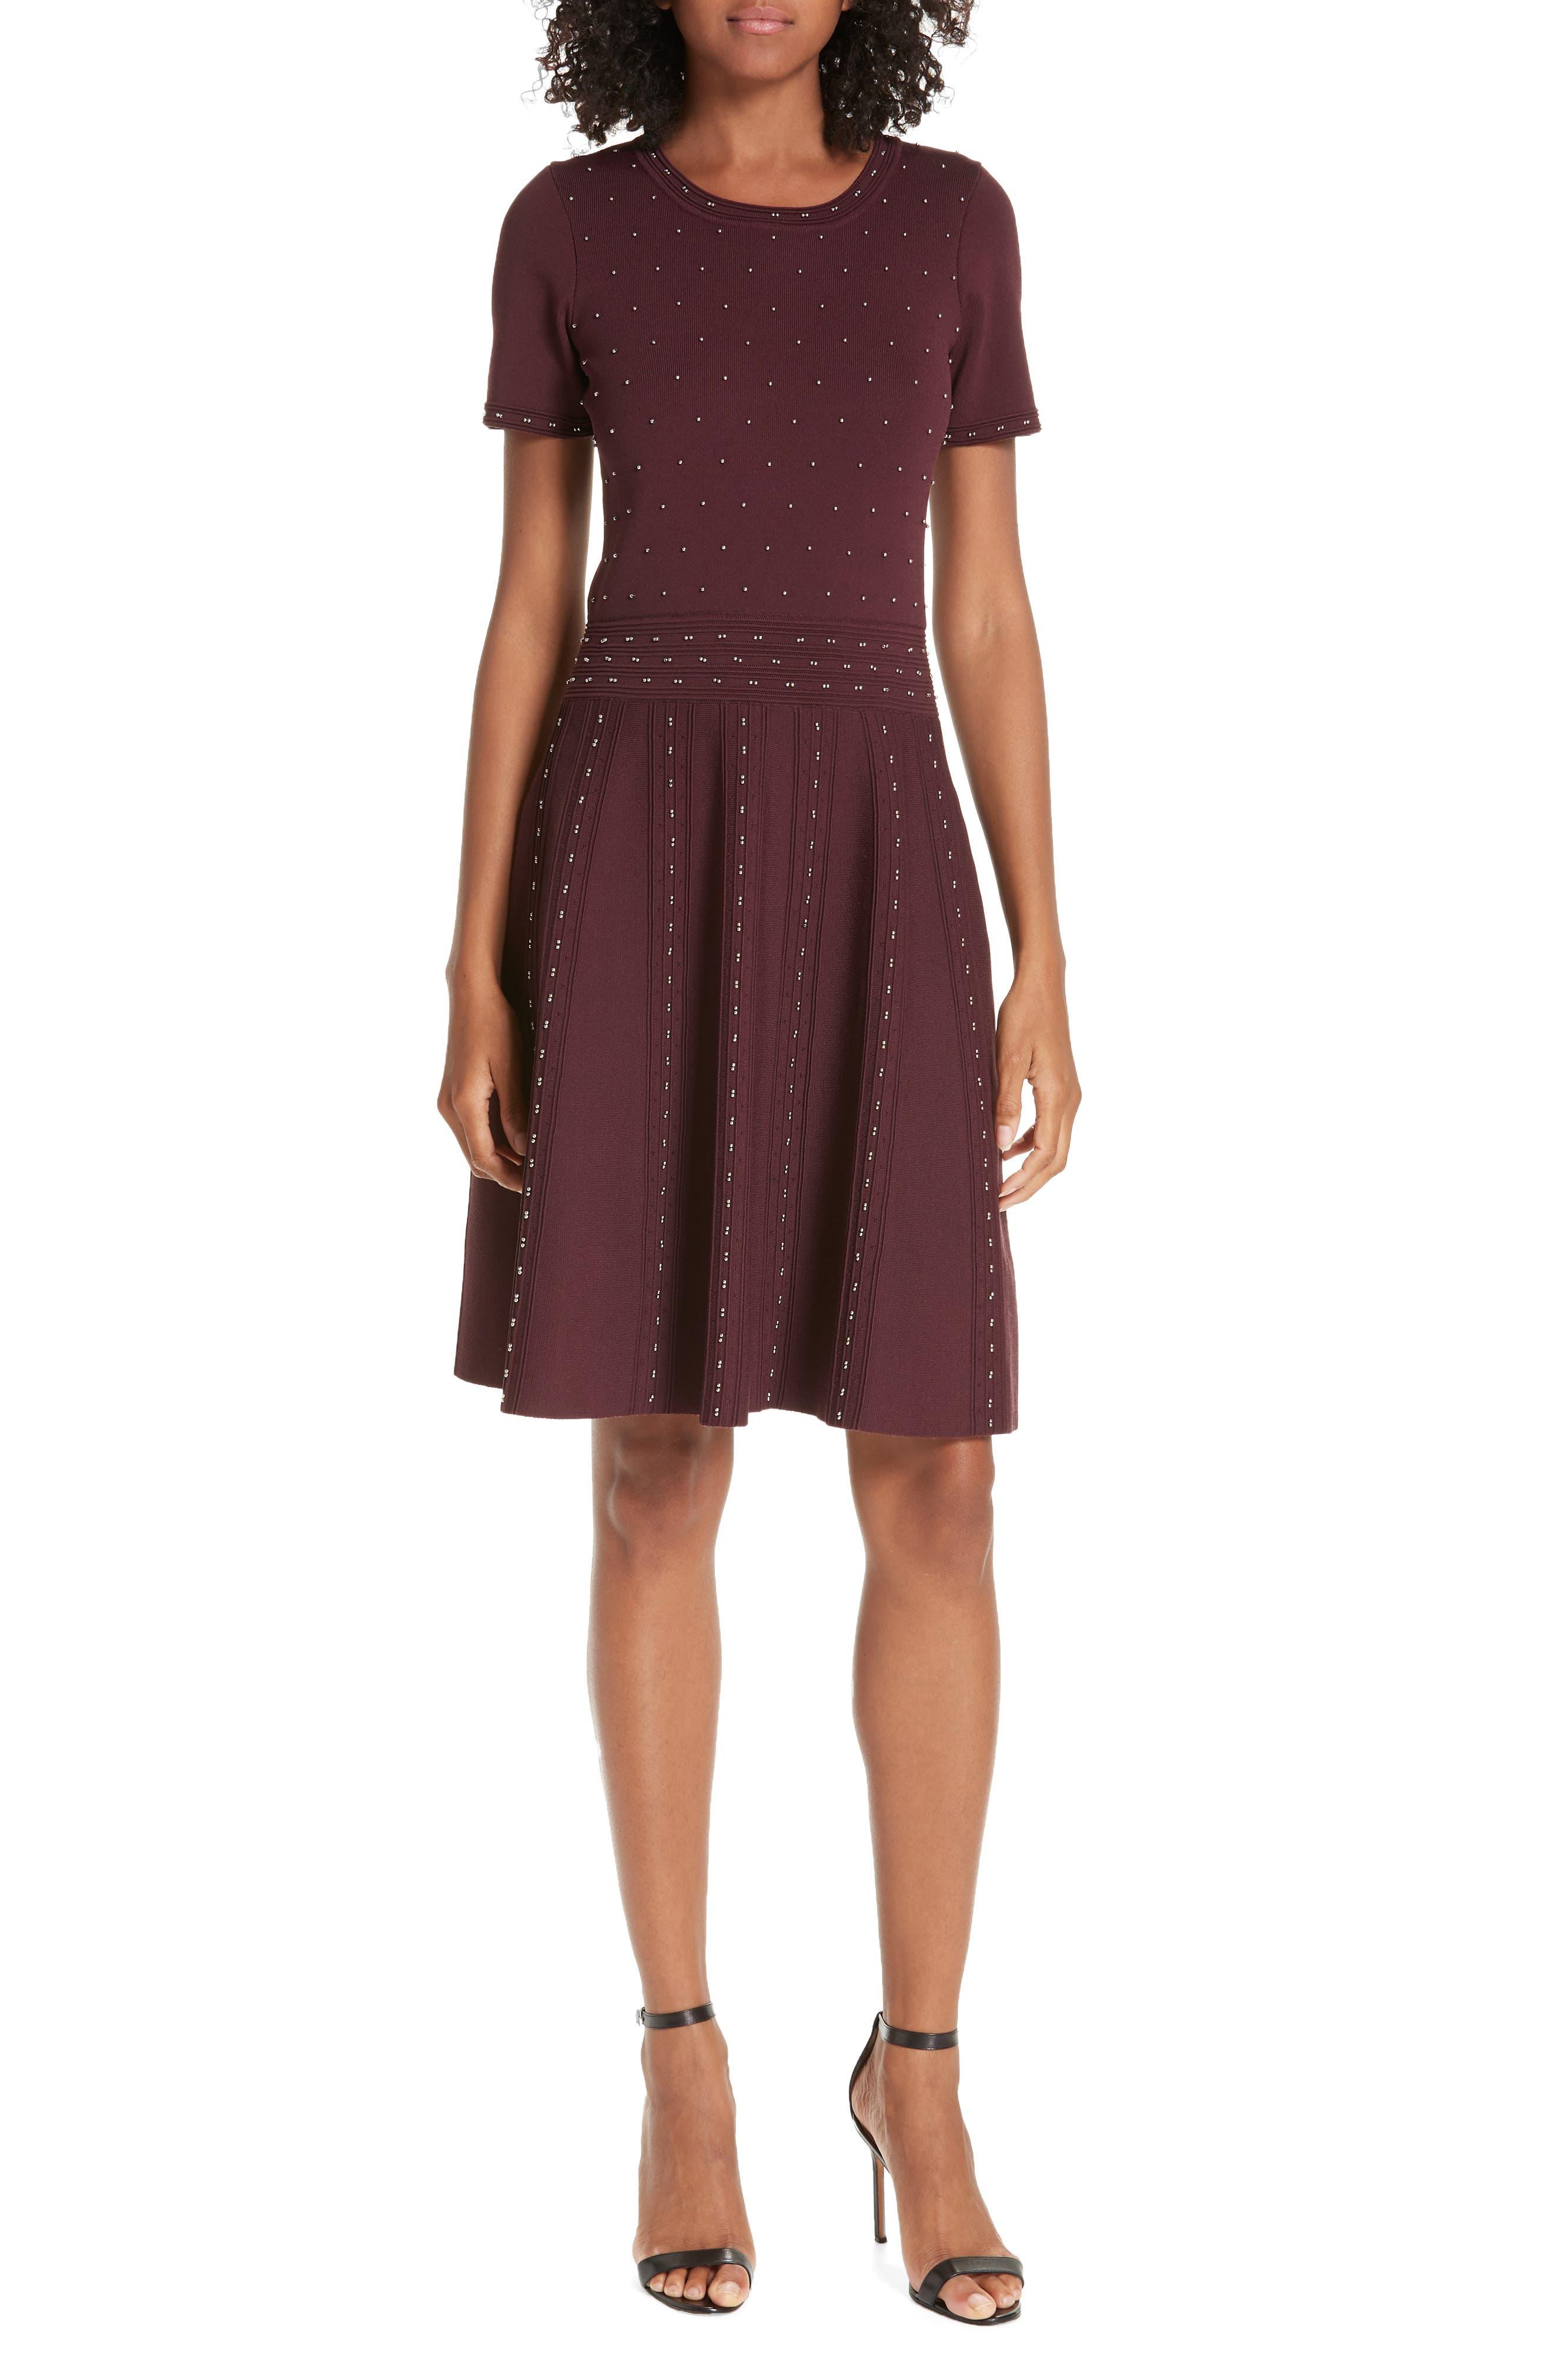 Montaigne Metallic Bead Fit & Flare Dress,                             Main thumbnail 1, color,                             613